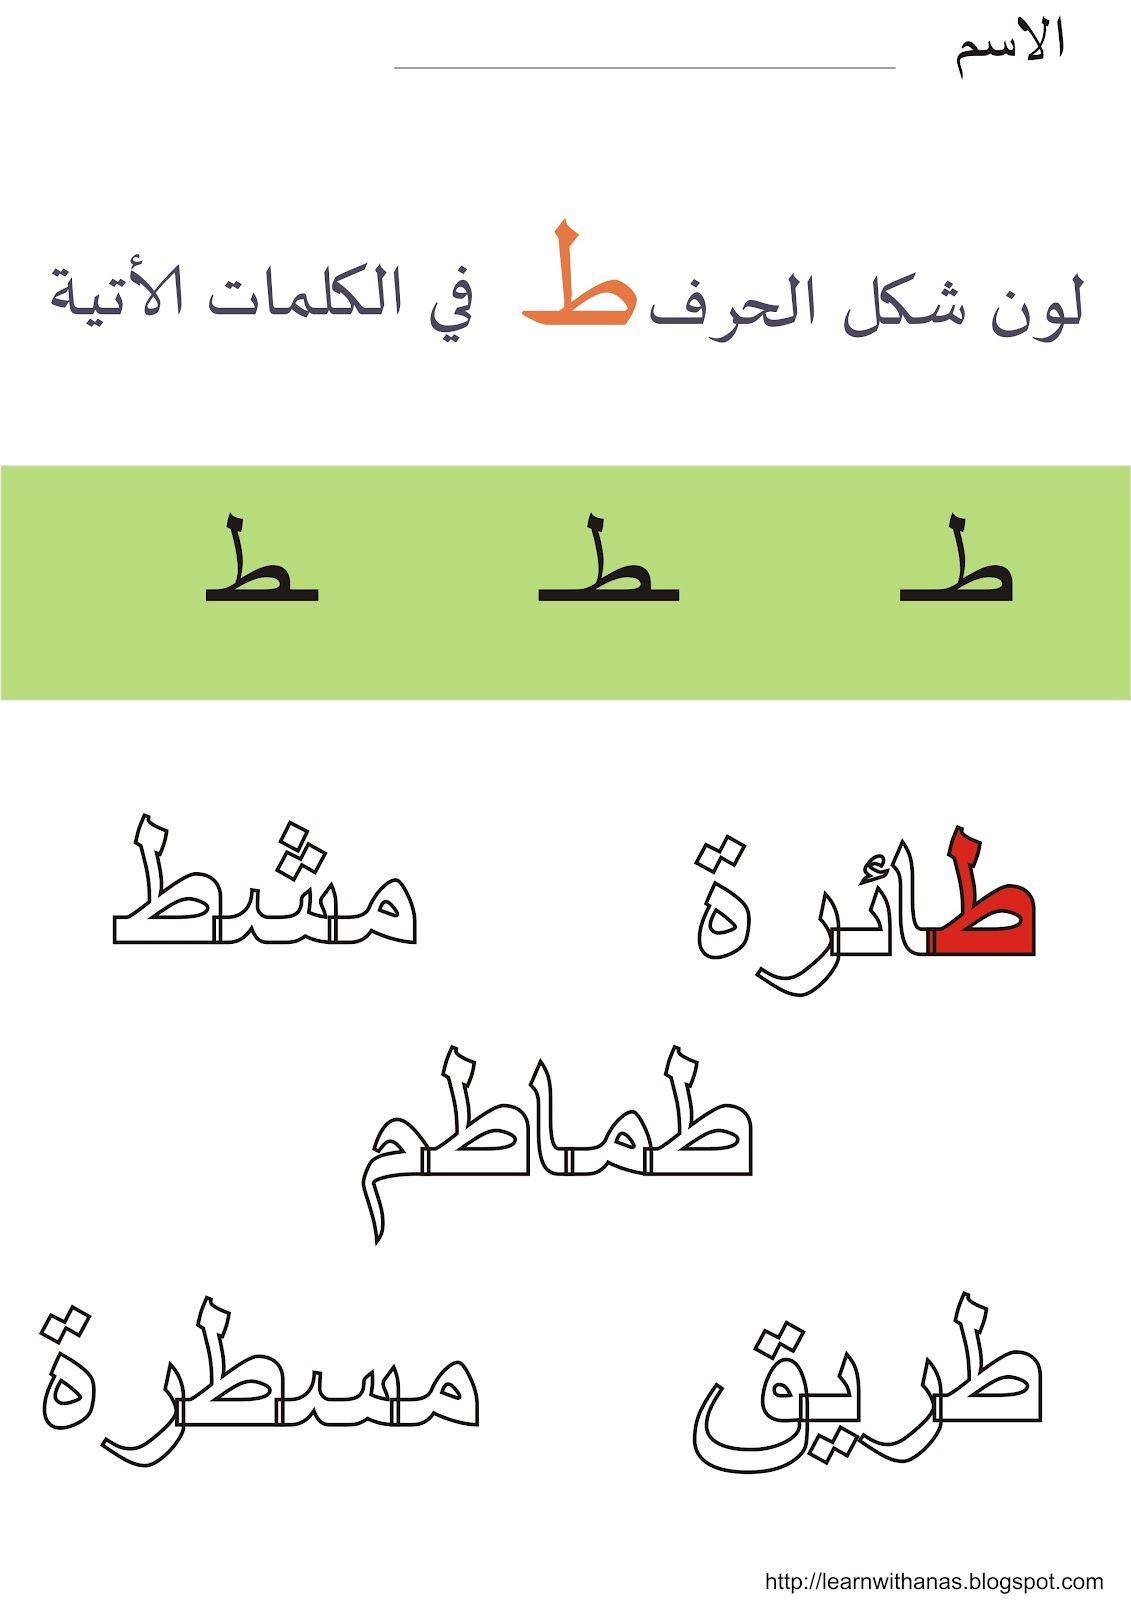 Shakel El 7aref Ttaa